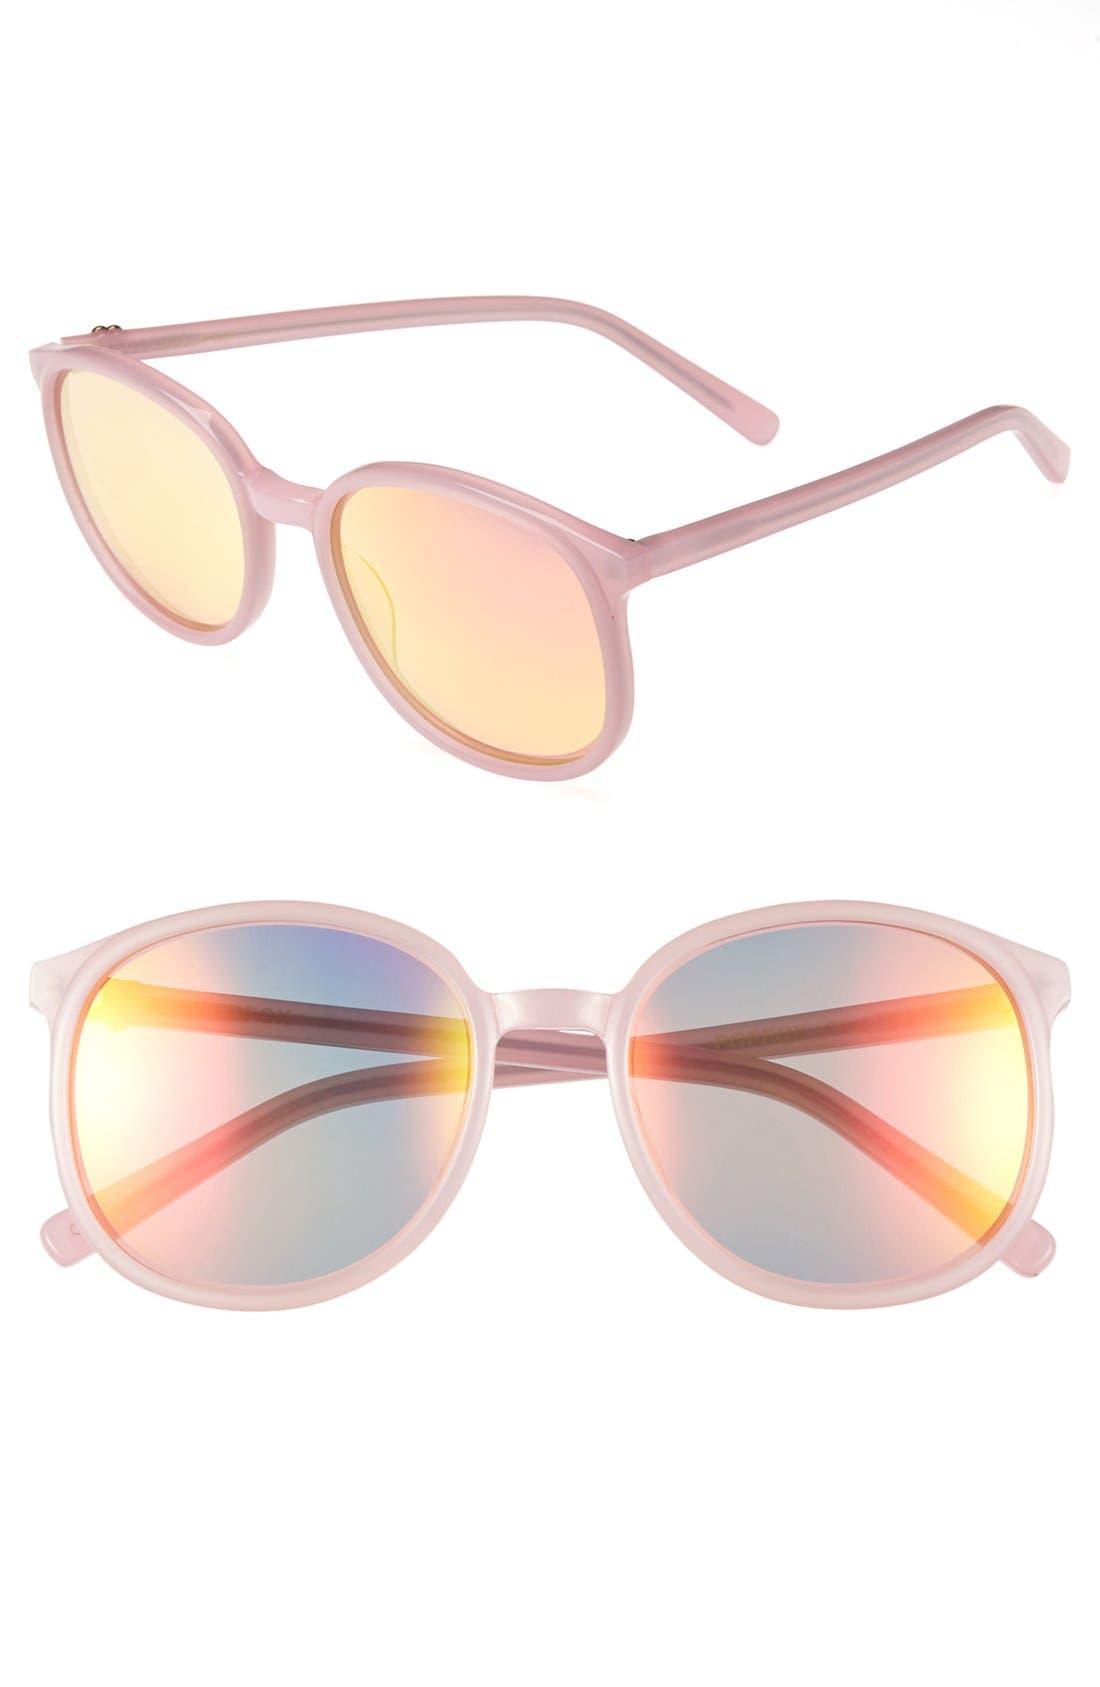 Main Image - Wildfox 'Popfox Deluxe' Sunglasses